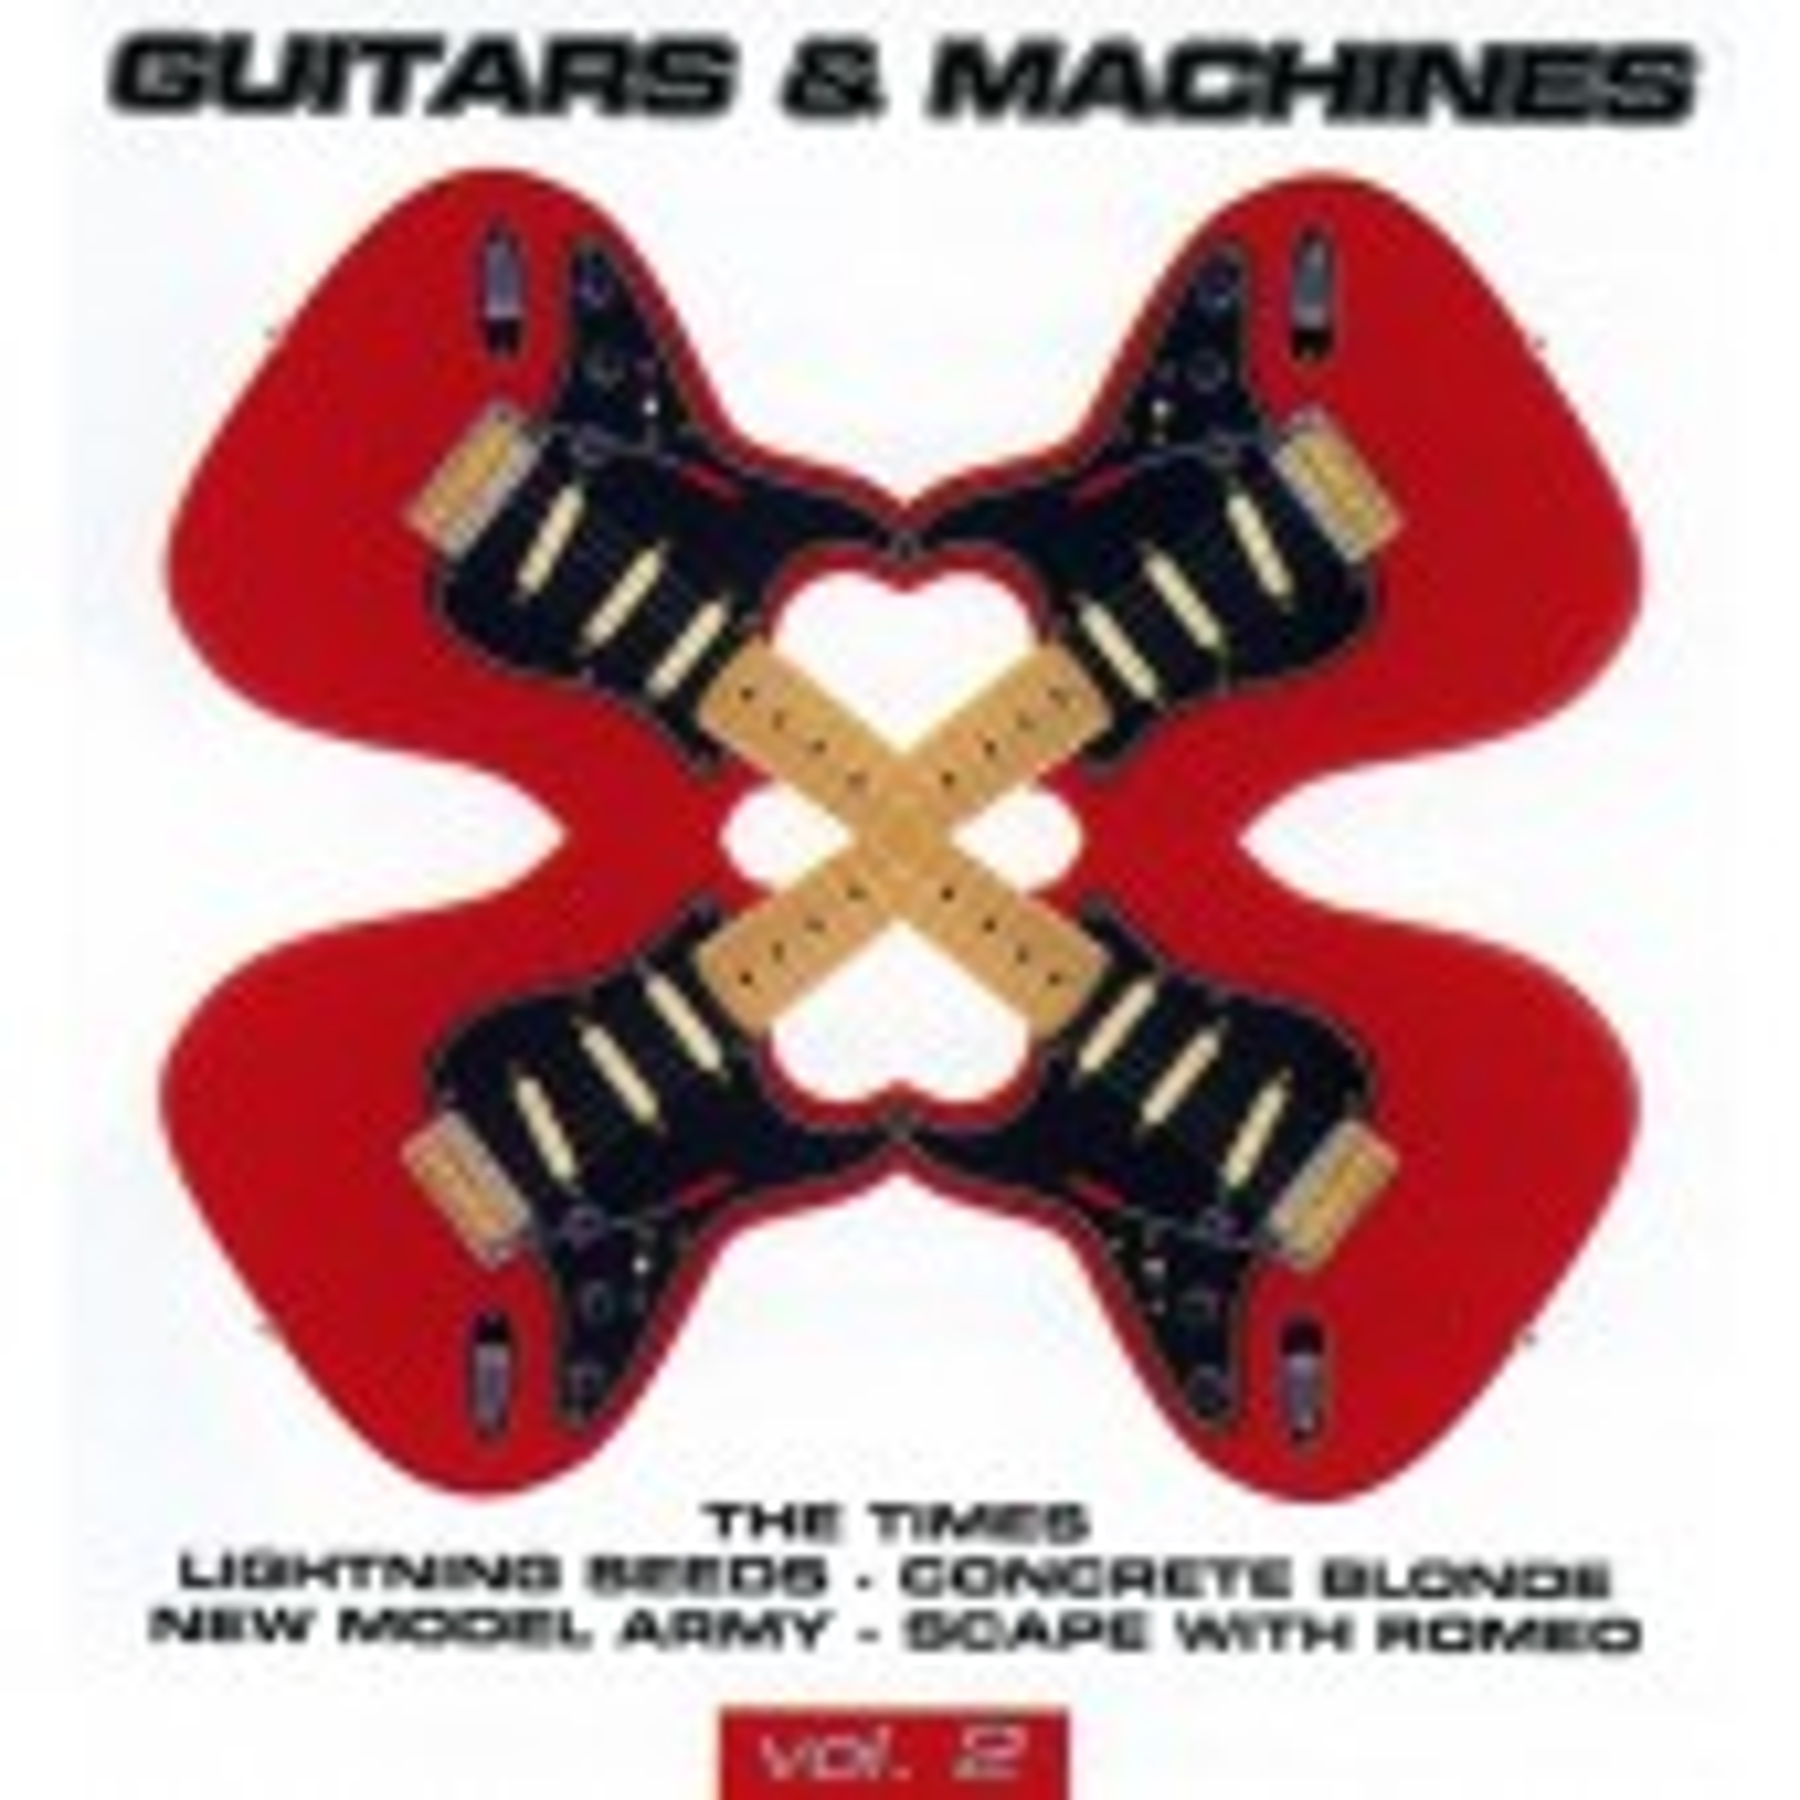 V.A. - Guitars & Machines vol. 2 - 2CD